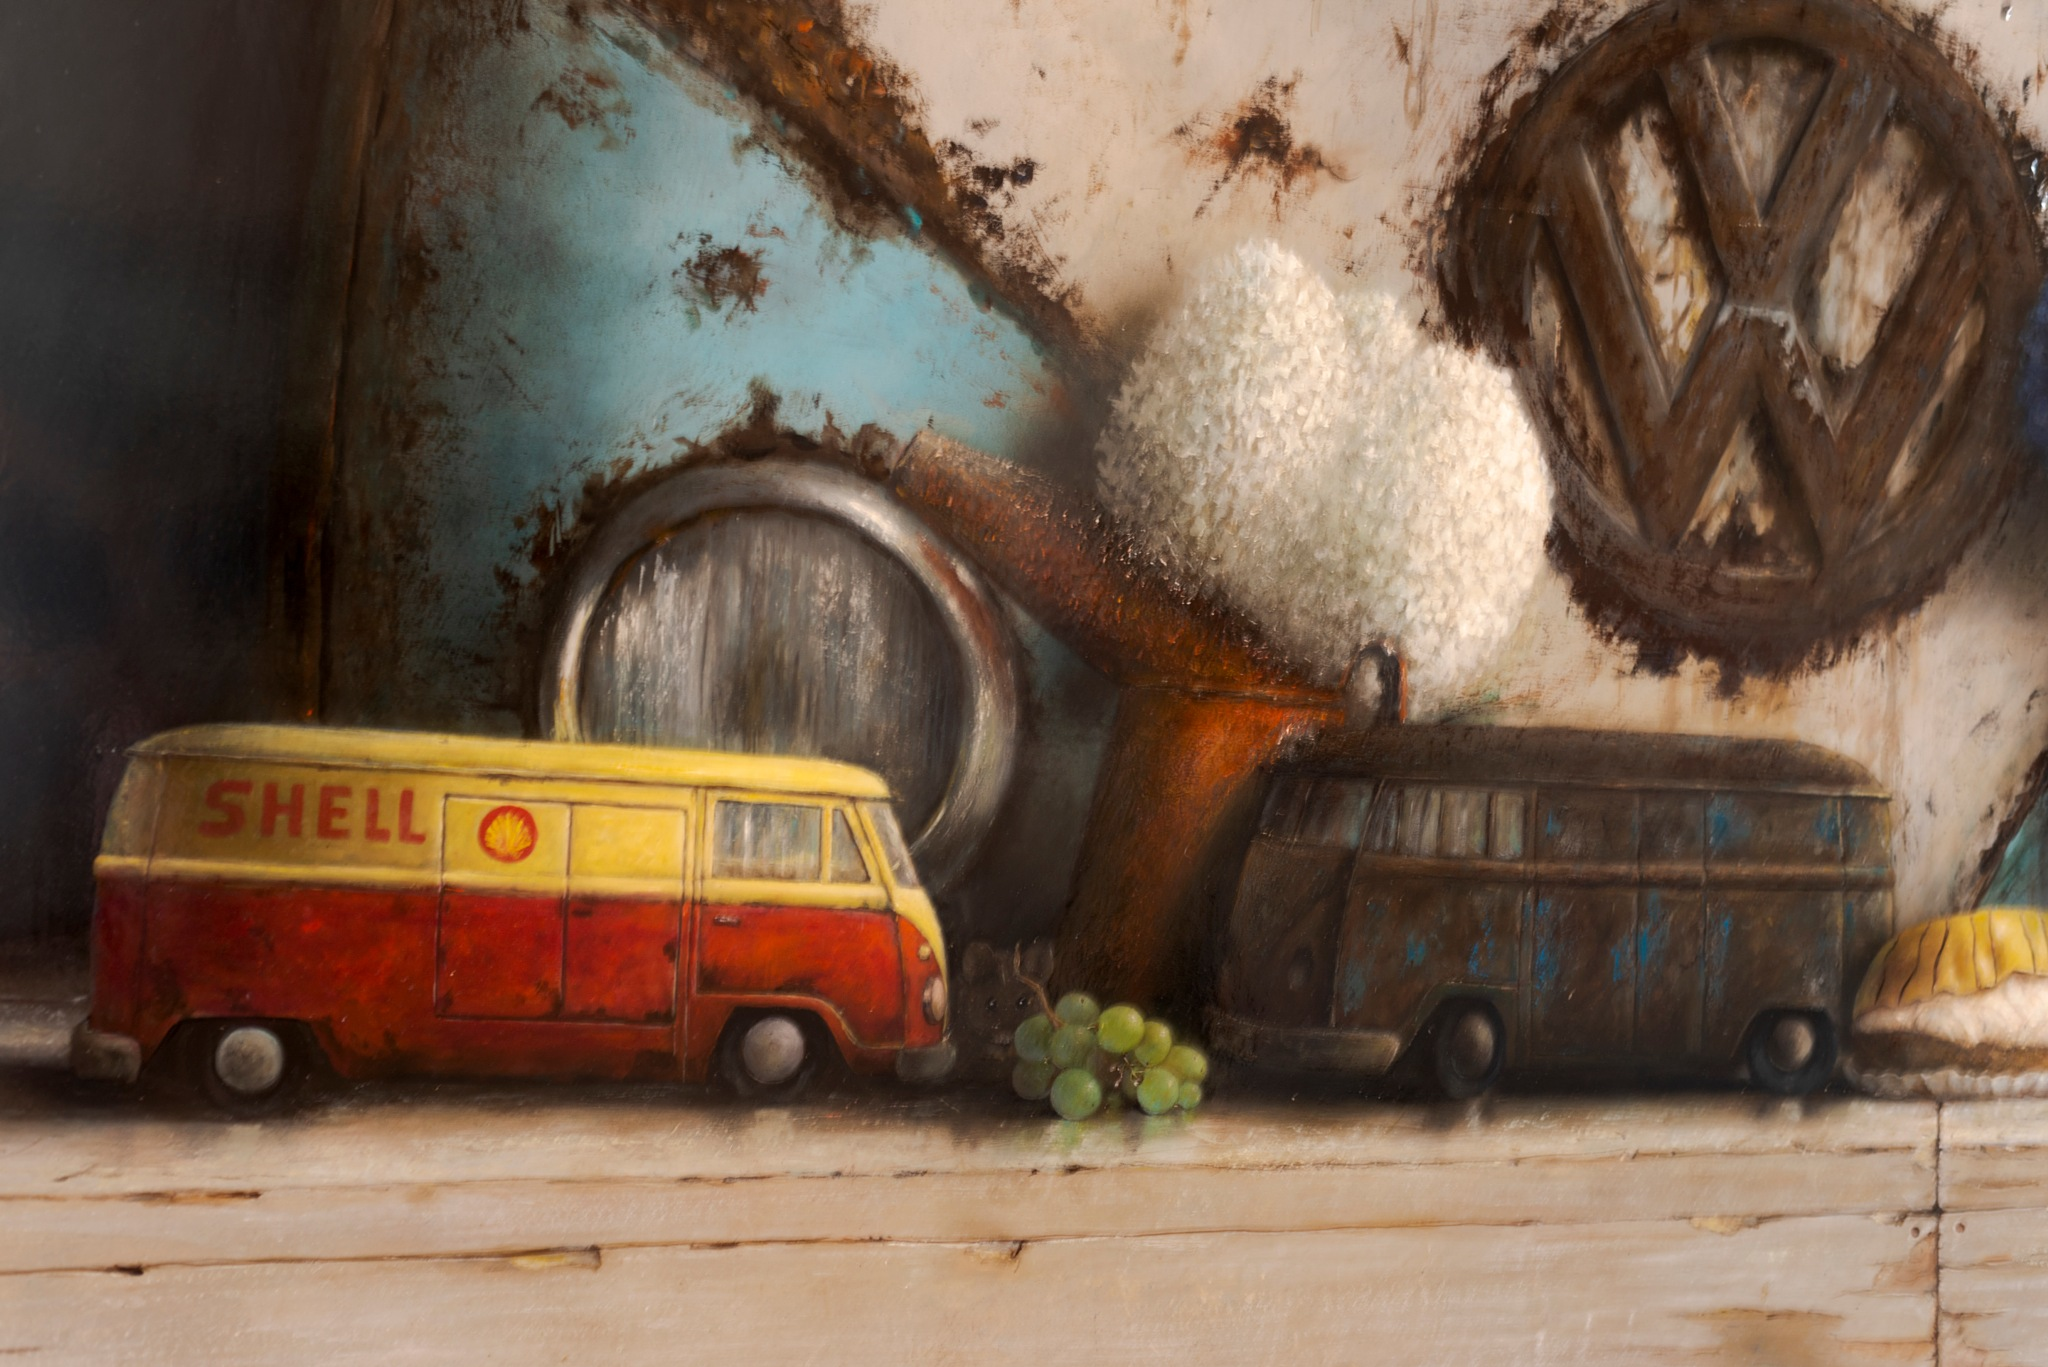 Art. by Harrie Eickenboom.